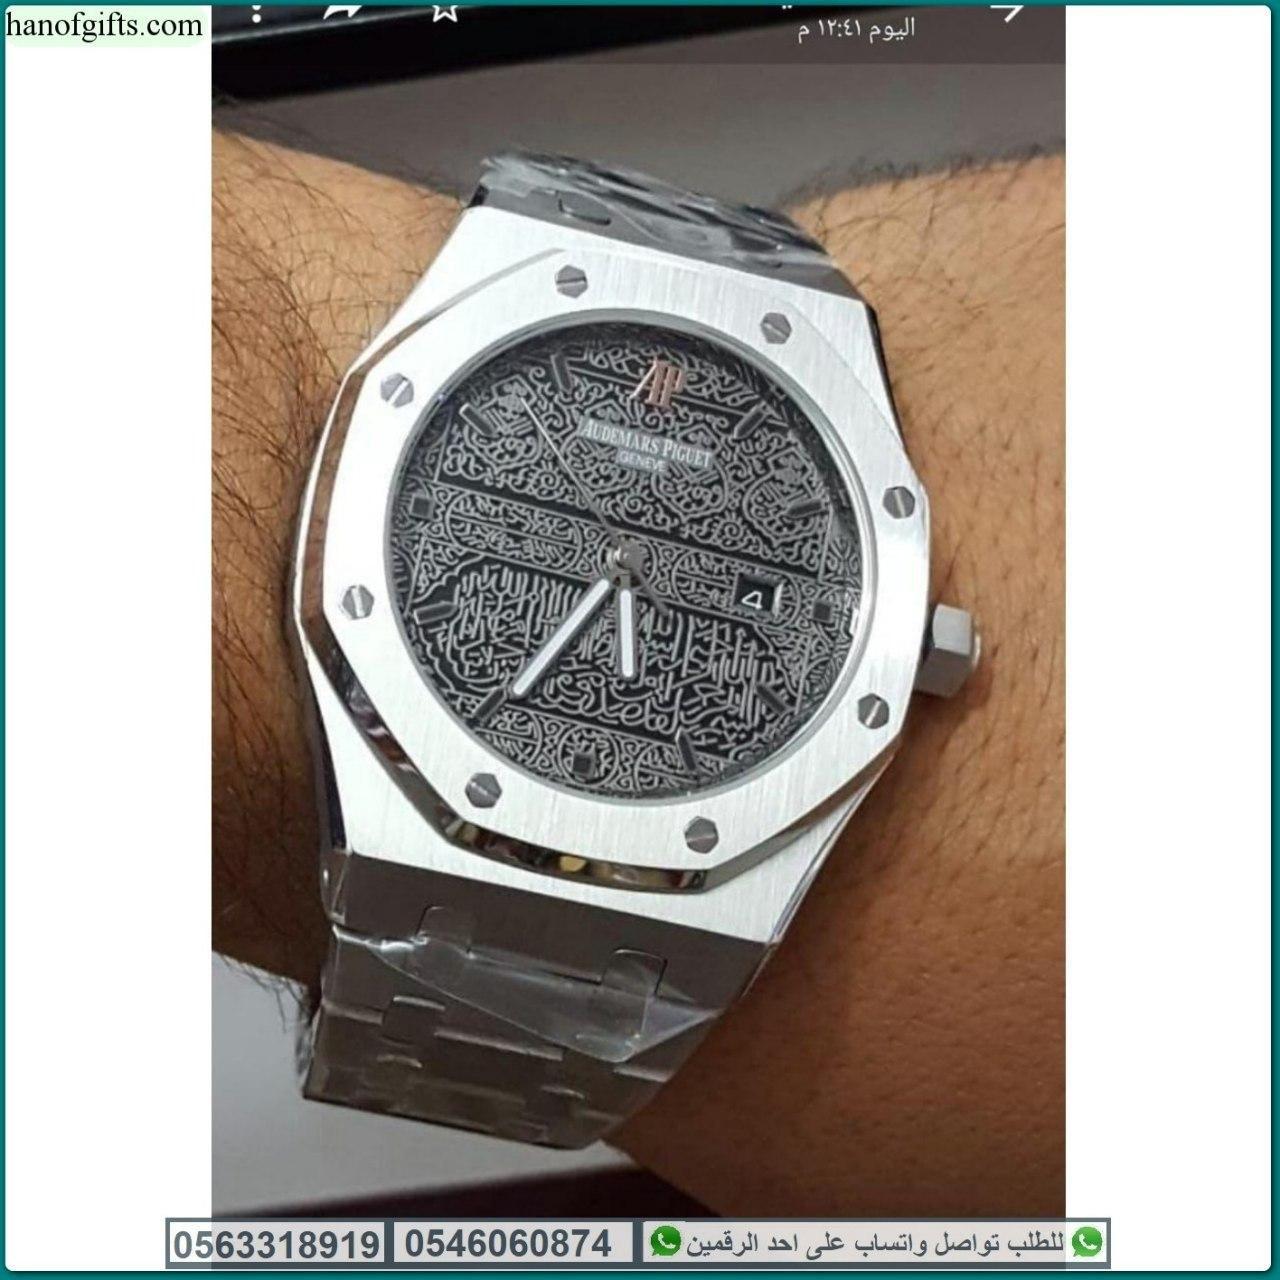 ساعات ادمر بياجيه رجالي درجه اولى مع علبه و كرت الماركه هدايا هنوف Accessories Jaeger Watch Watches